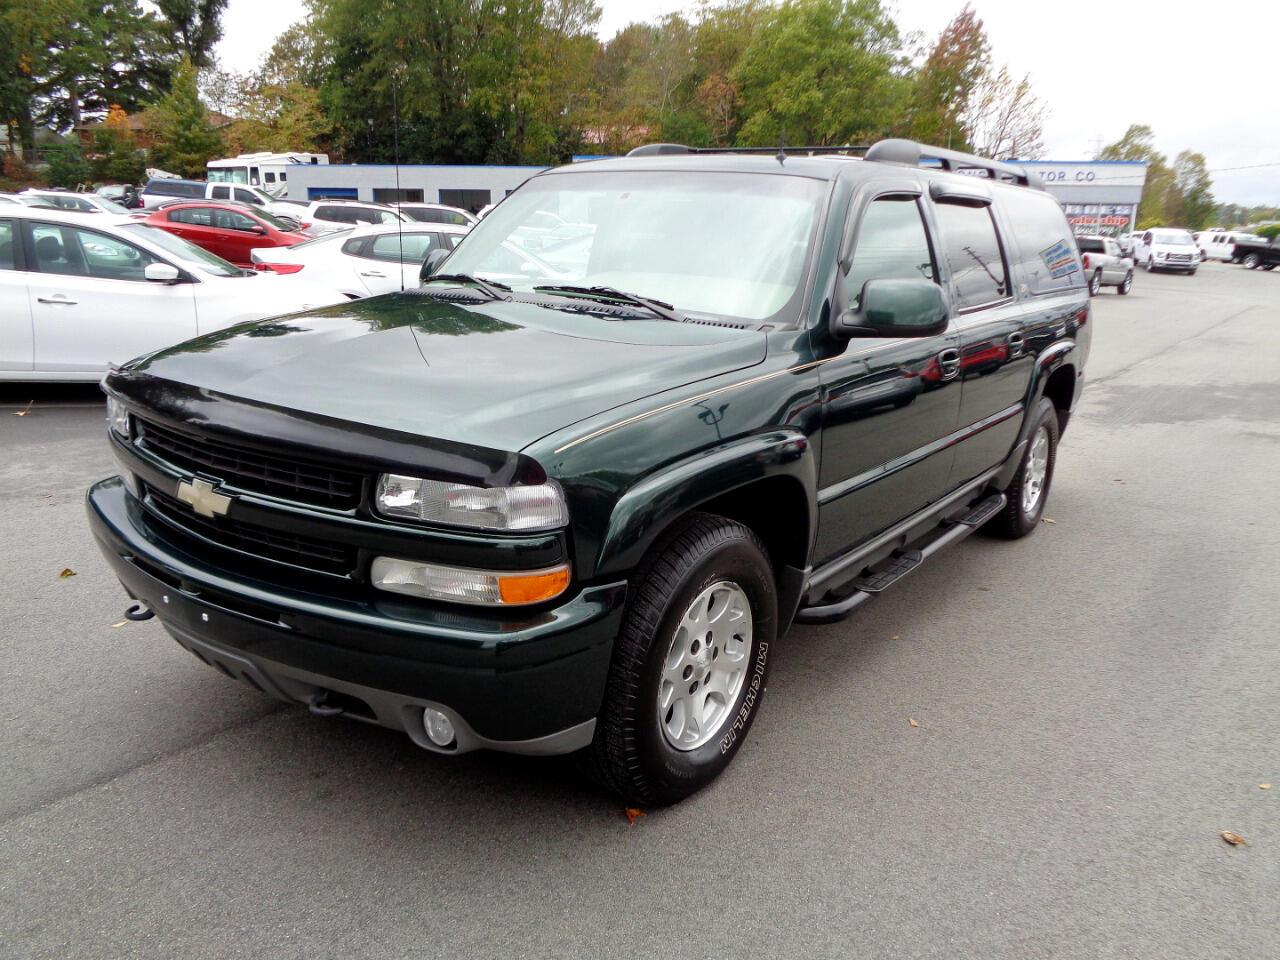 2002 Chevrolet Suburban 1500 Z-71 4WD